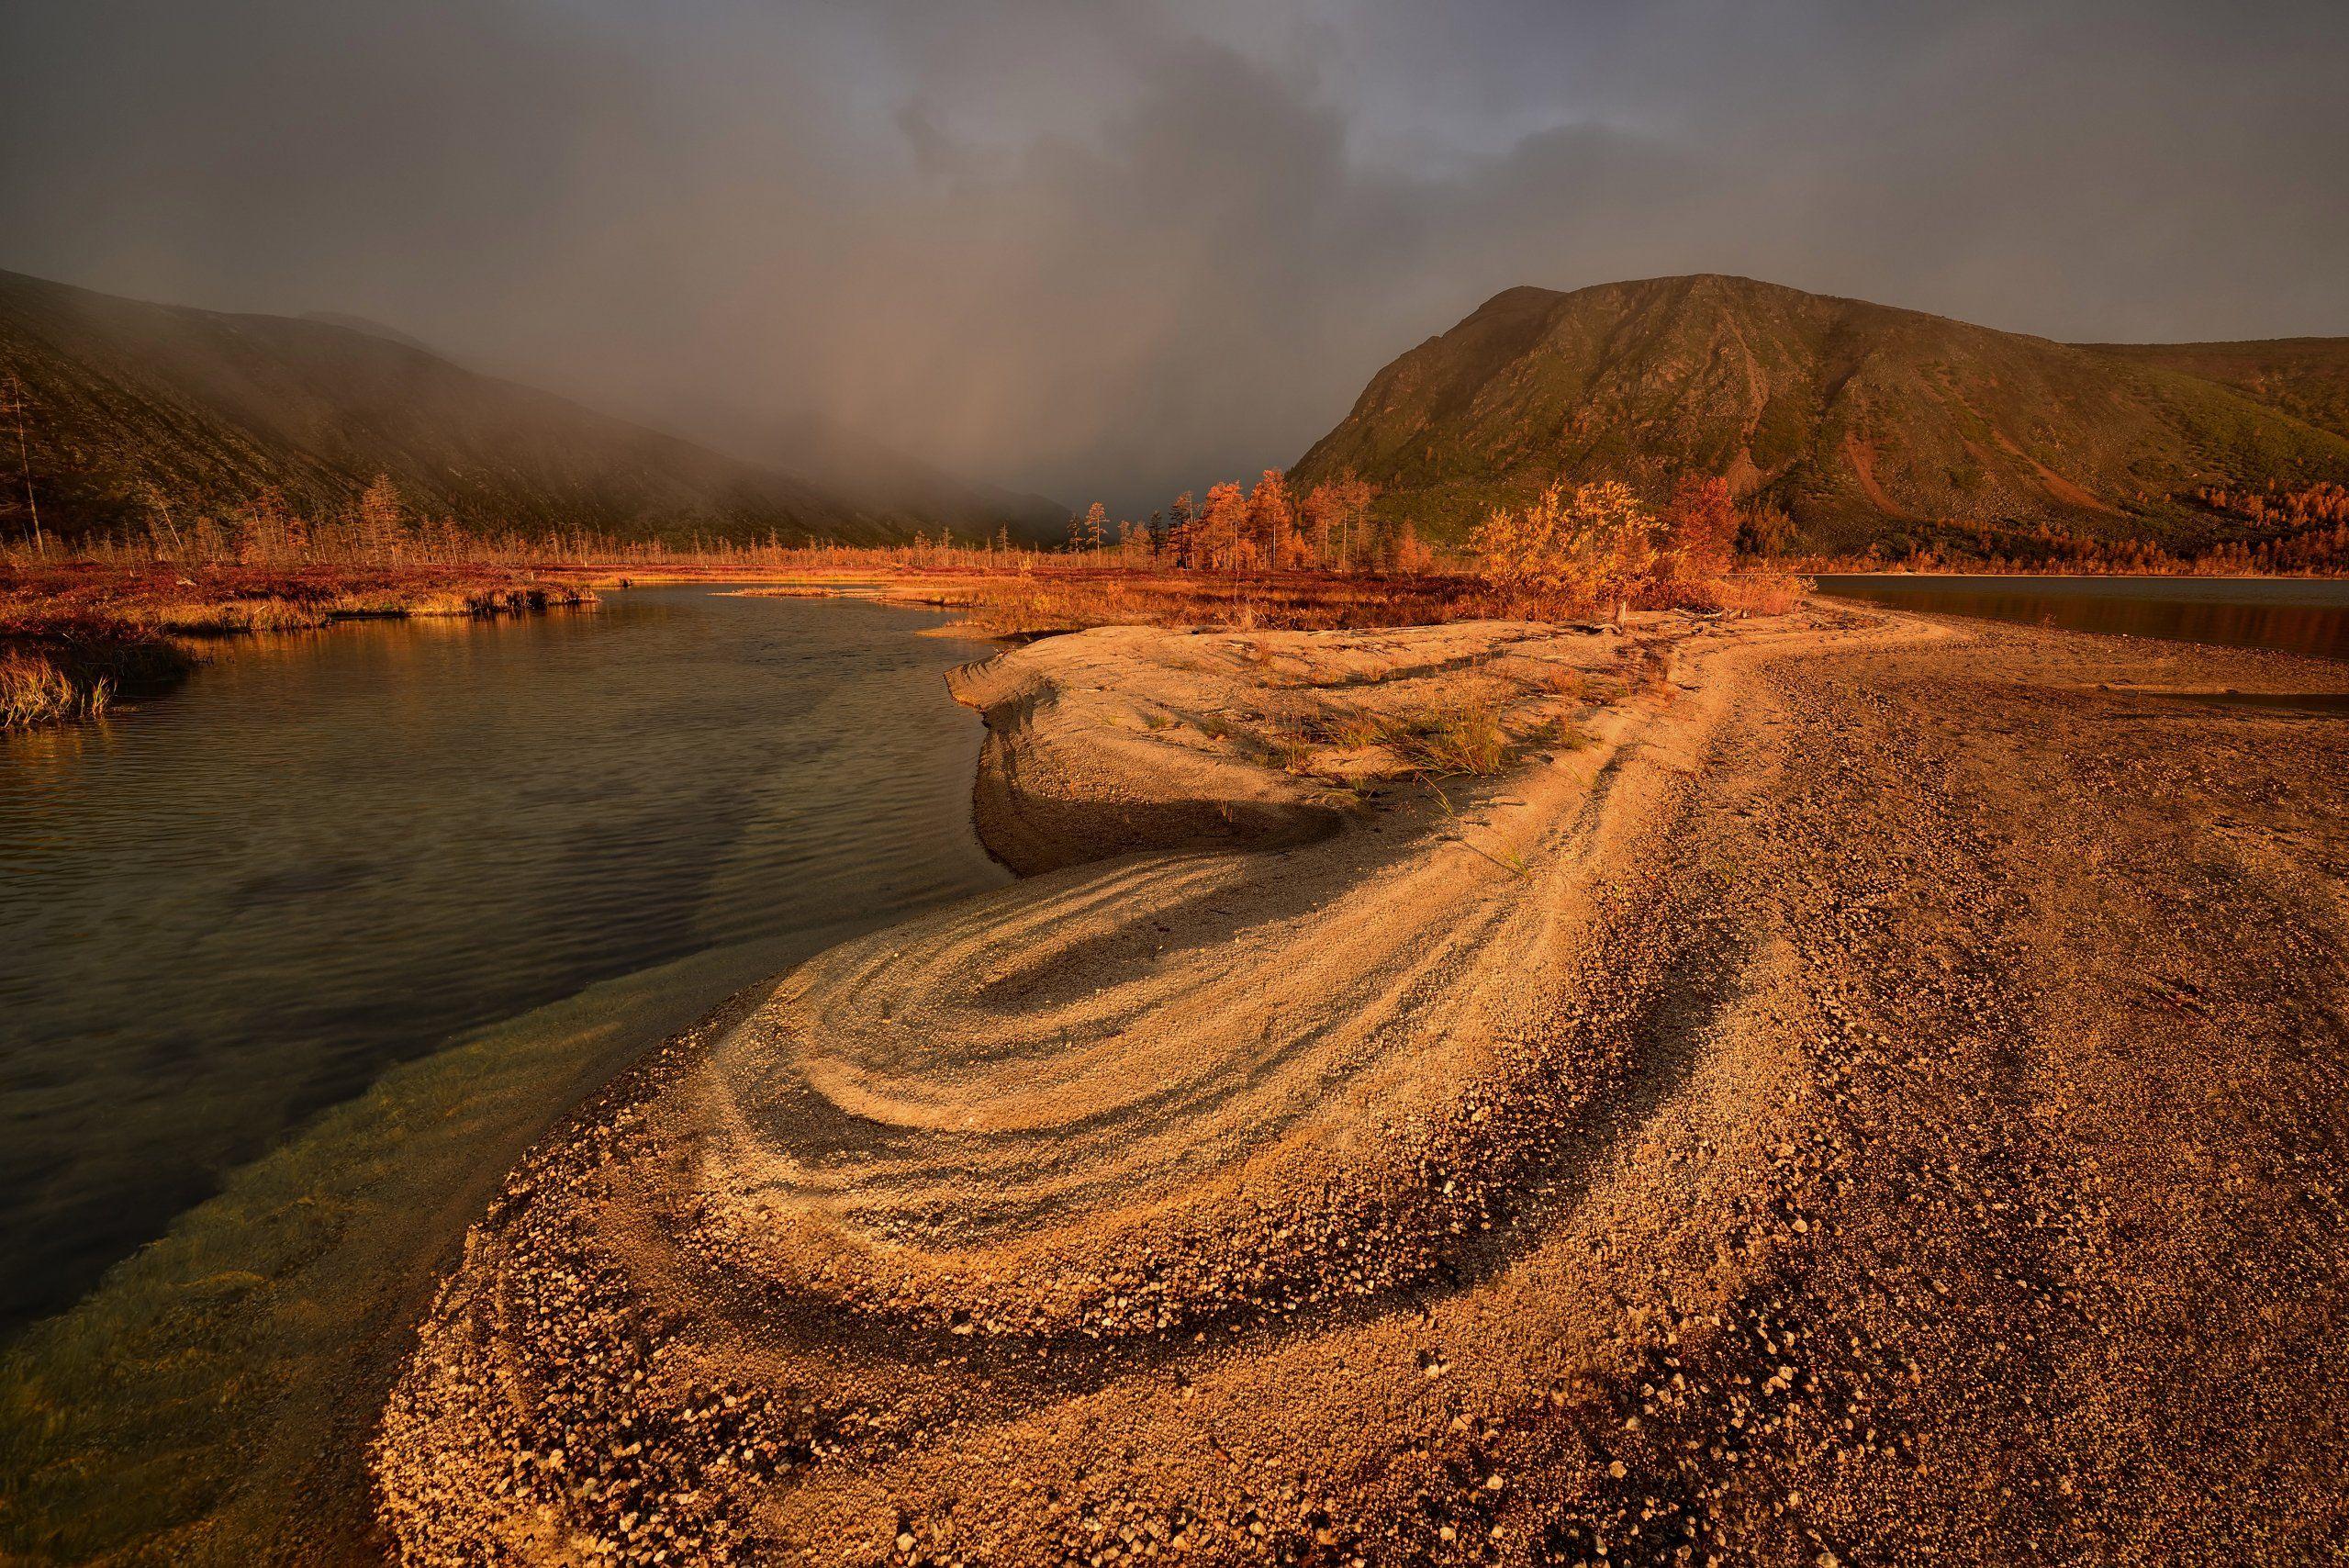 озеро, джека, лондона, Максим Евдокимов (phototourtravel.ru)